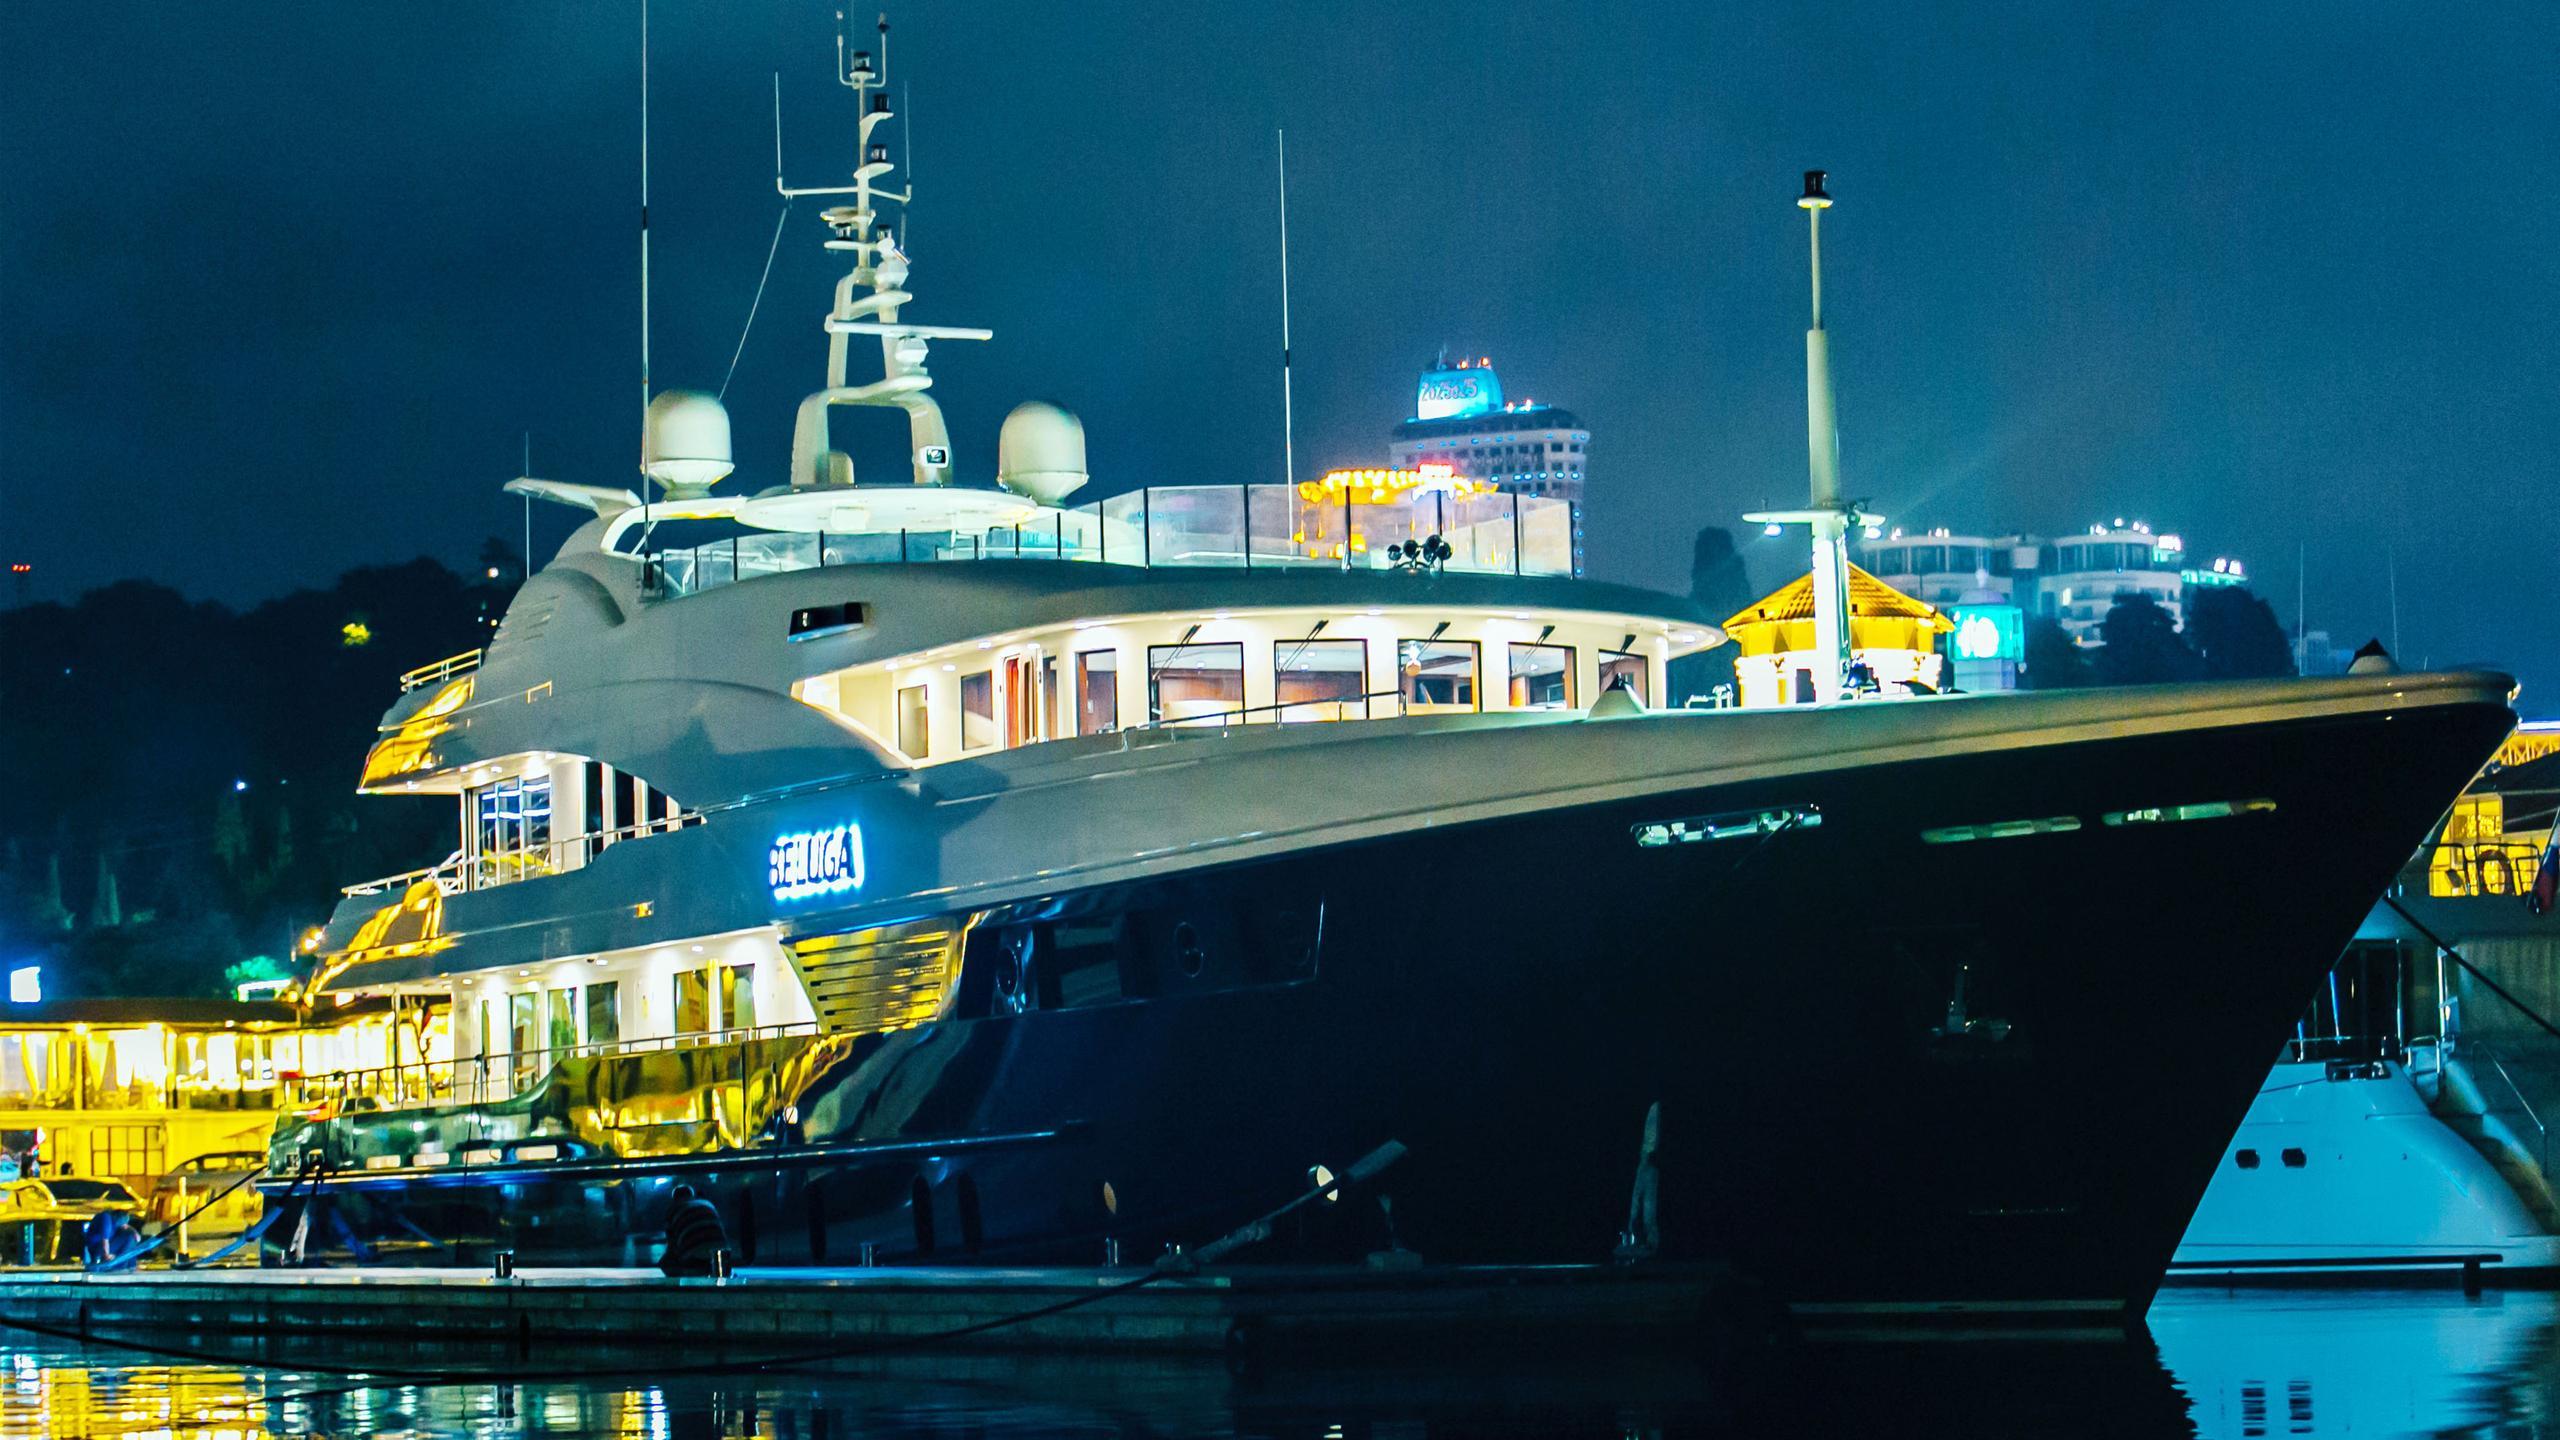 beluga-yacht-at-night